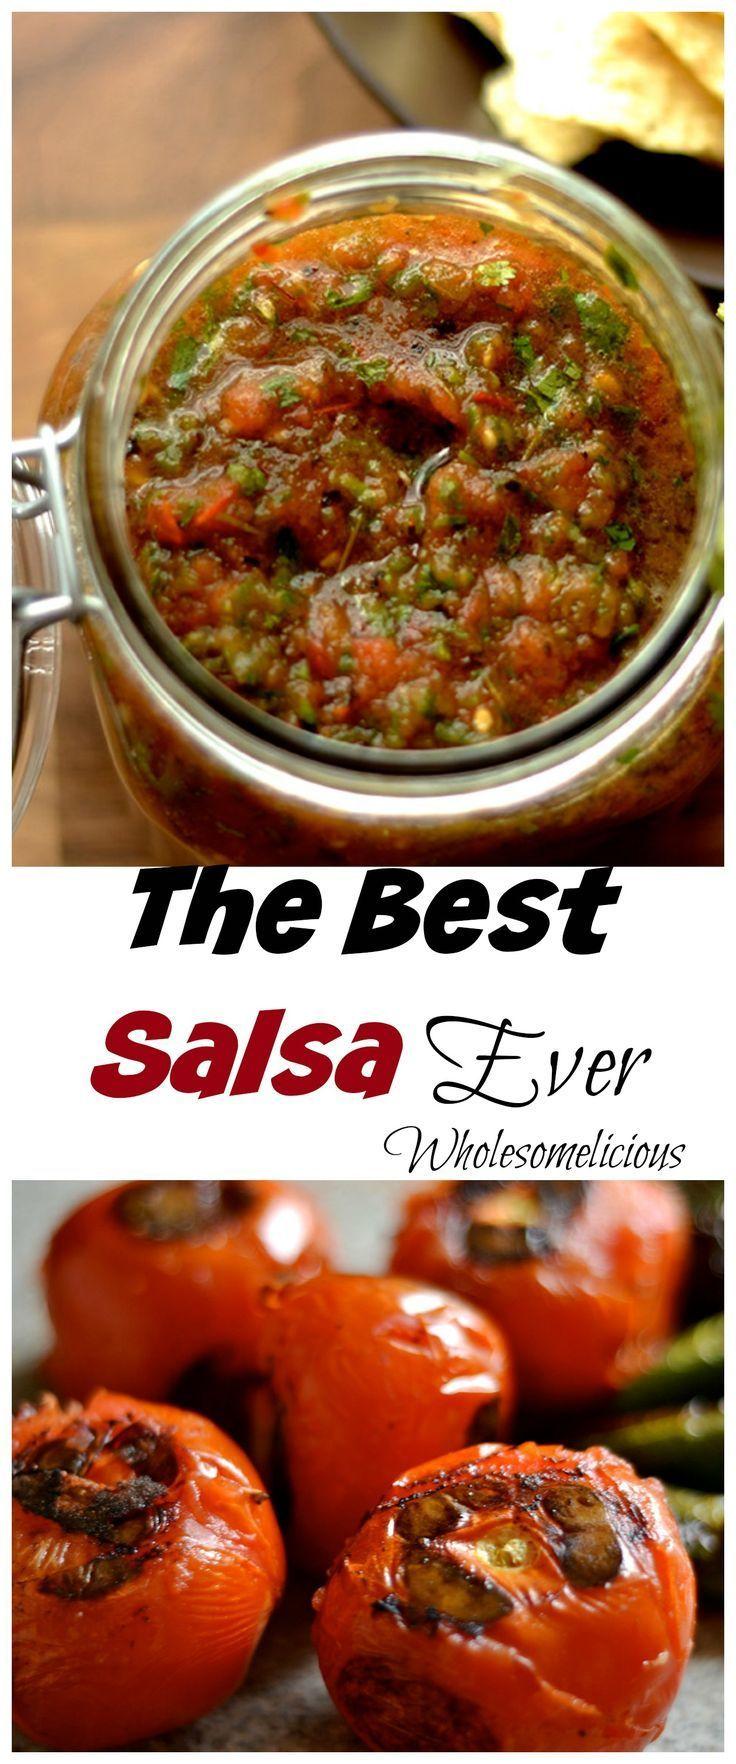 272 best Salsa, Sauce, etc. Recipes images on Pinterest | Sauce ...